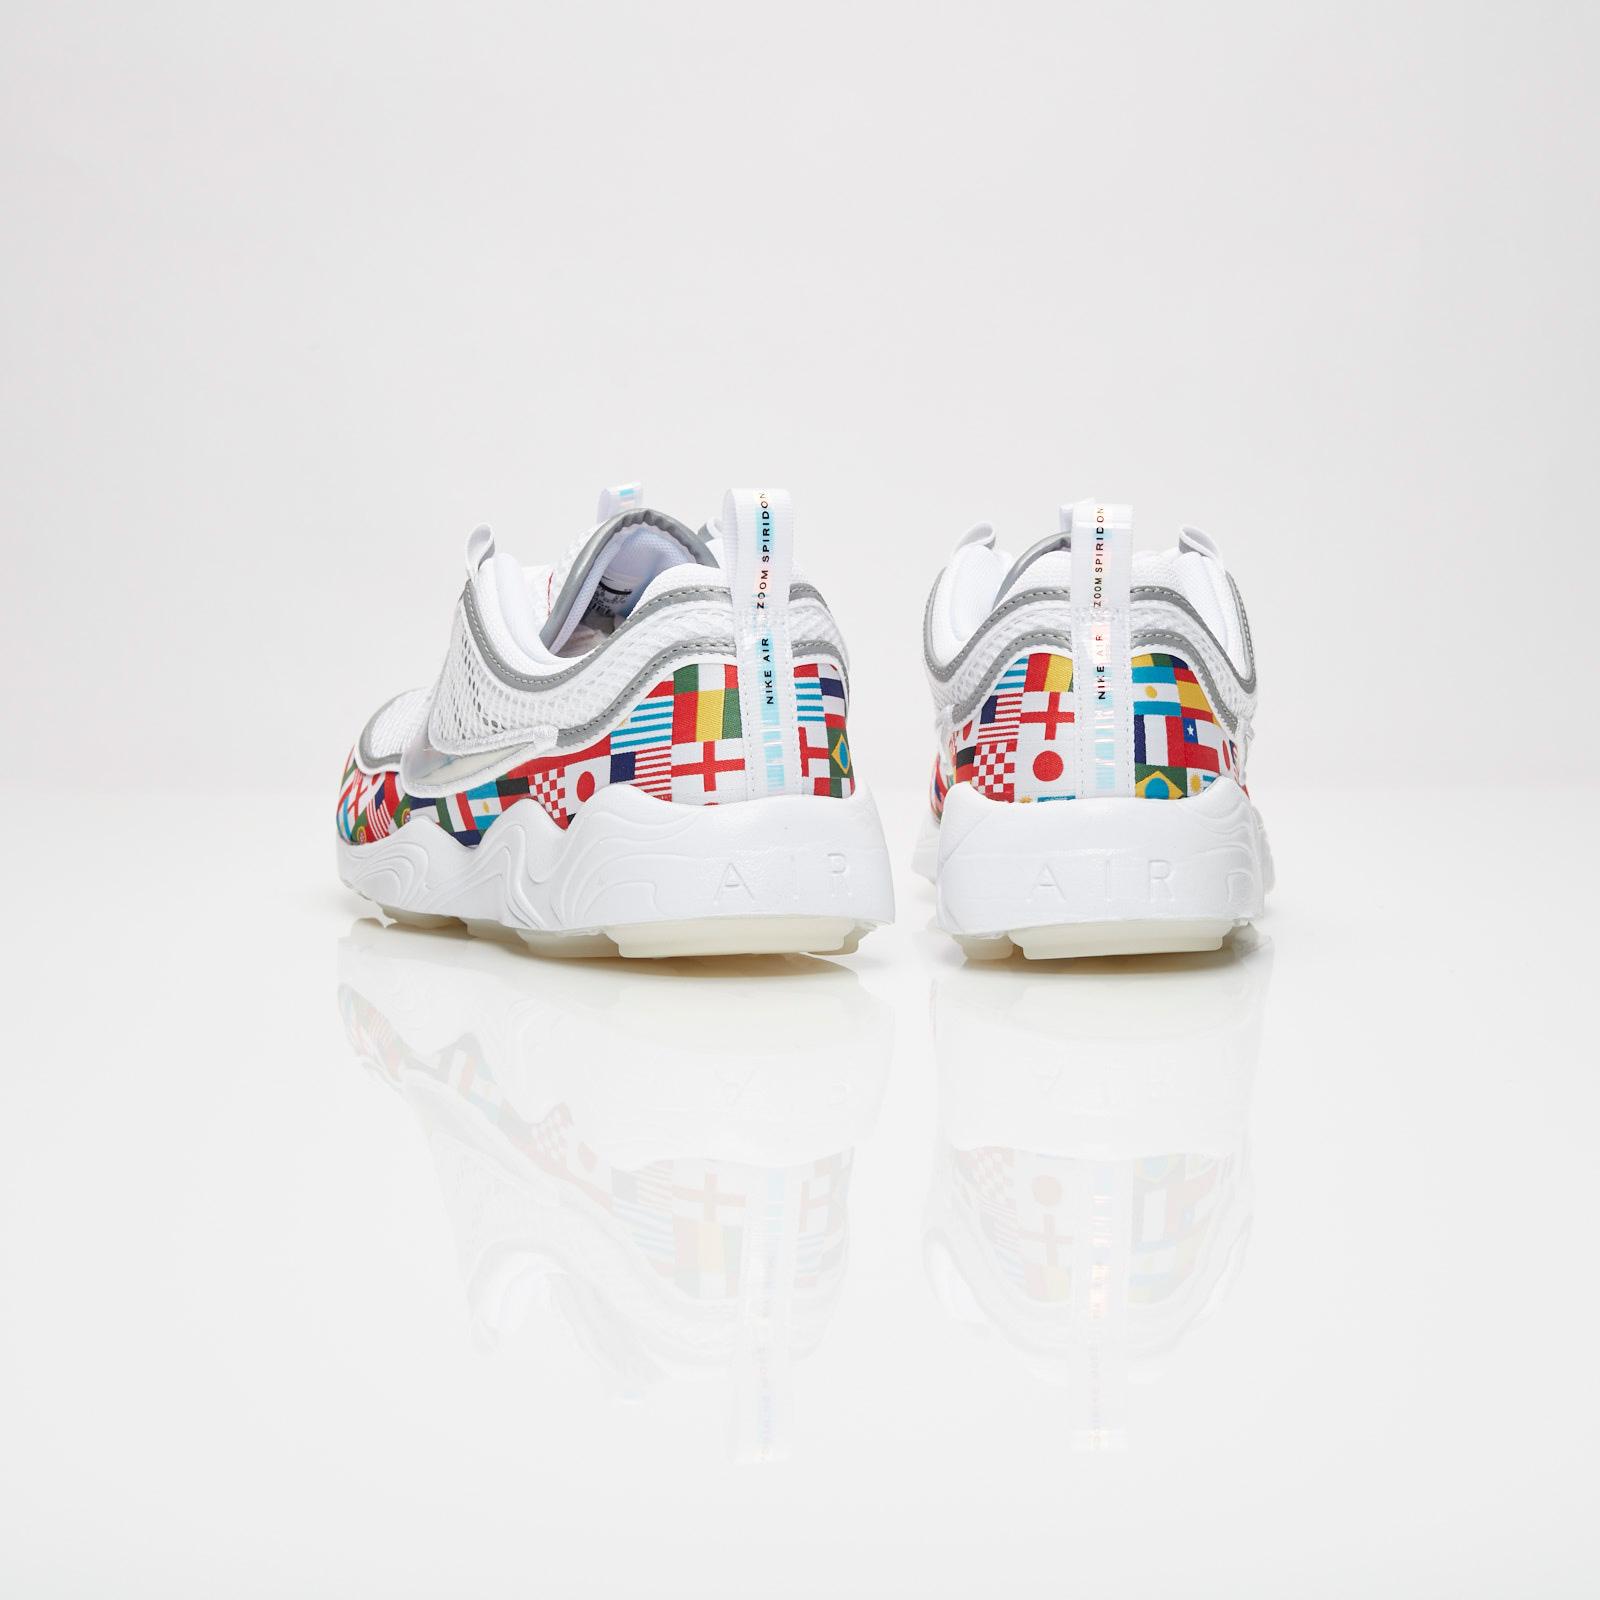 58995514df90 Nike Air Zoom Spiridon 16 NIC QS - Ao5121-100 - Sneakersnstuff ...